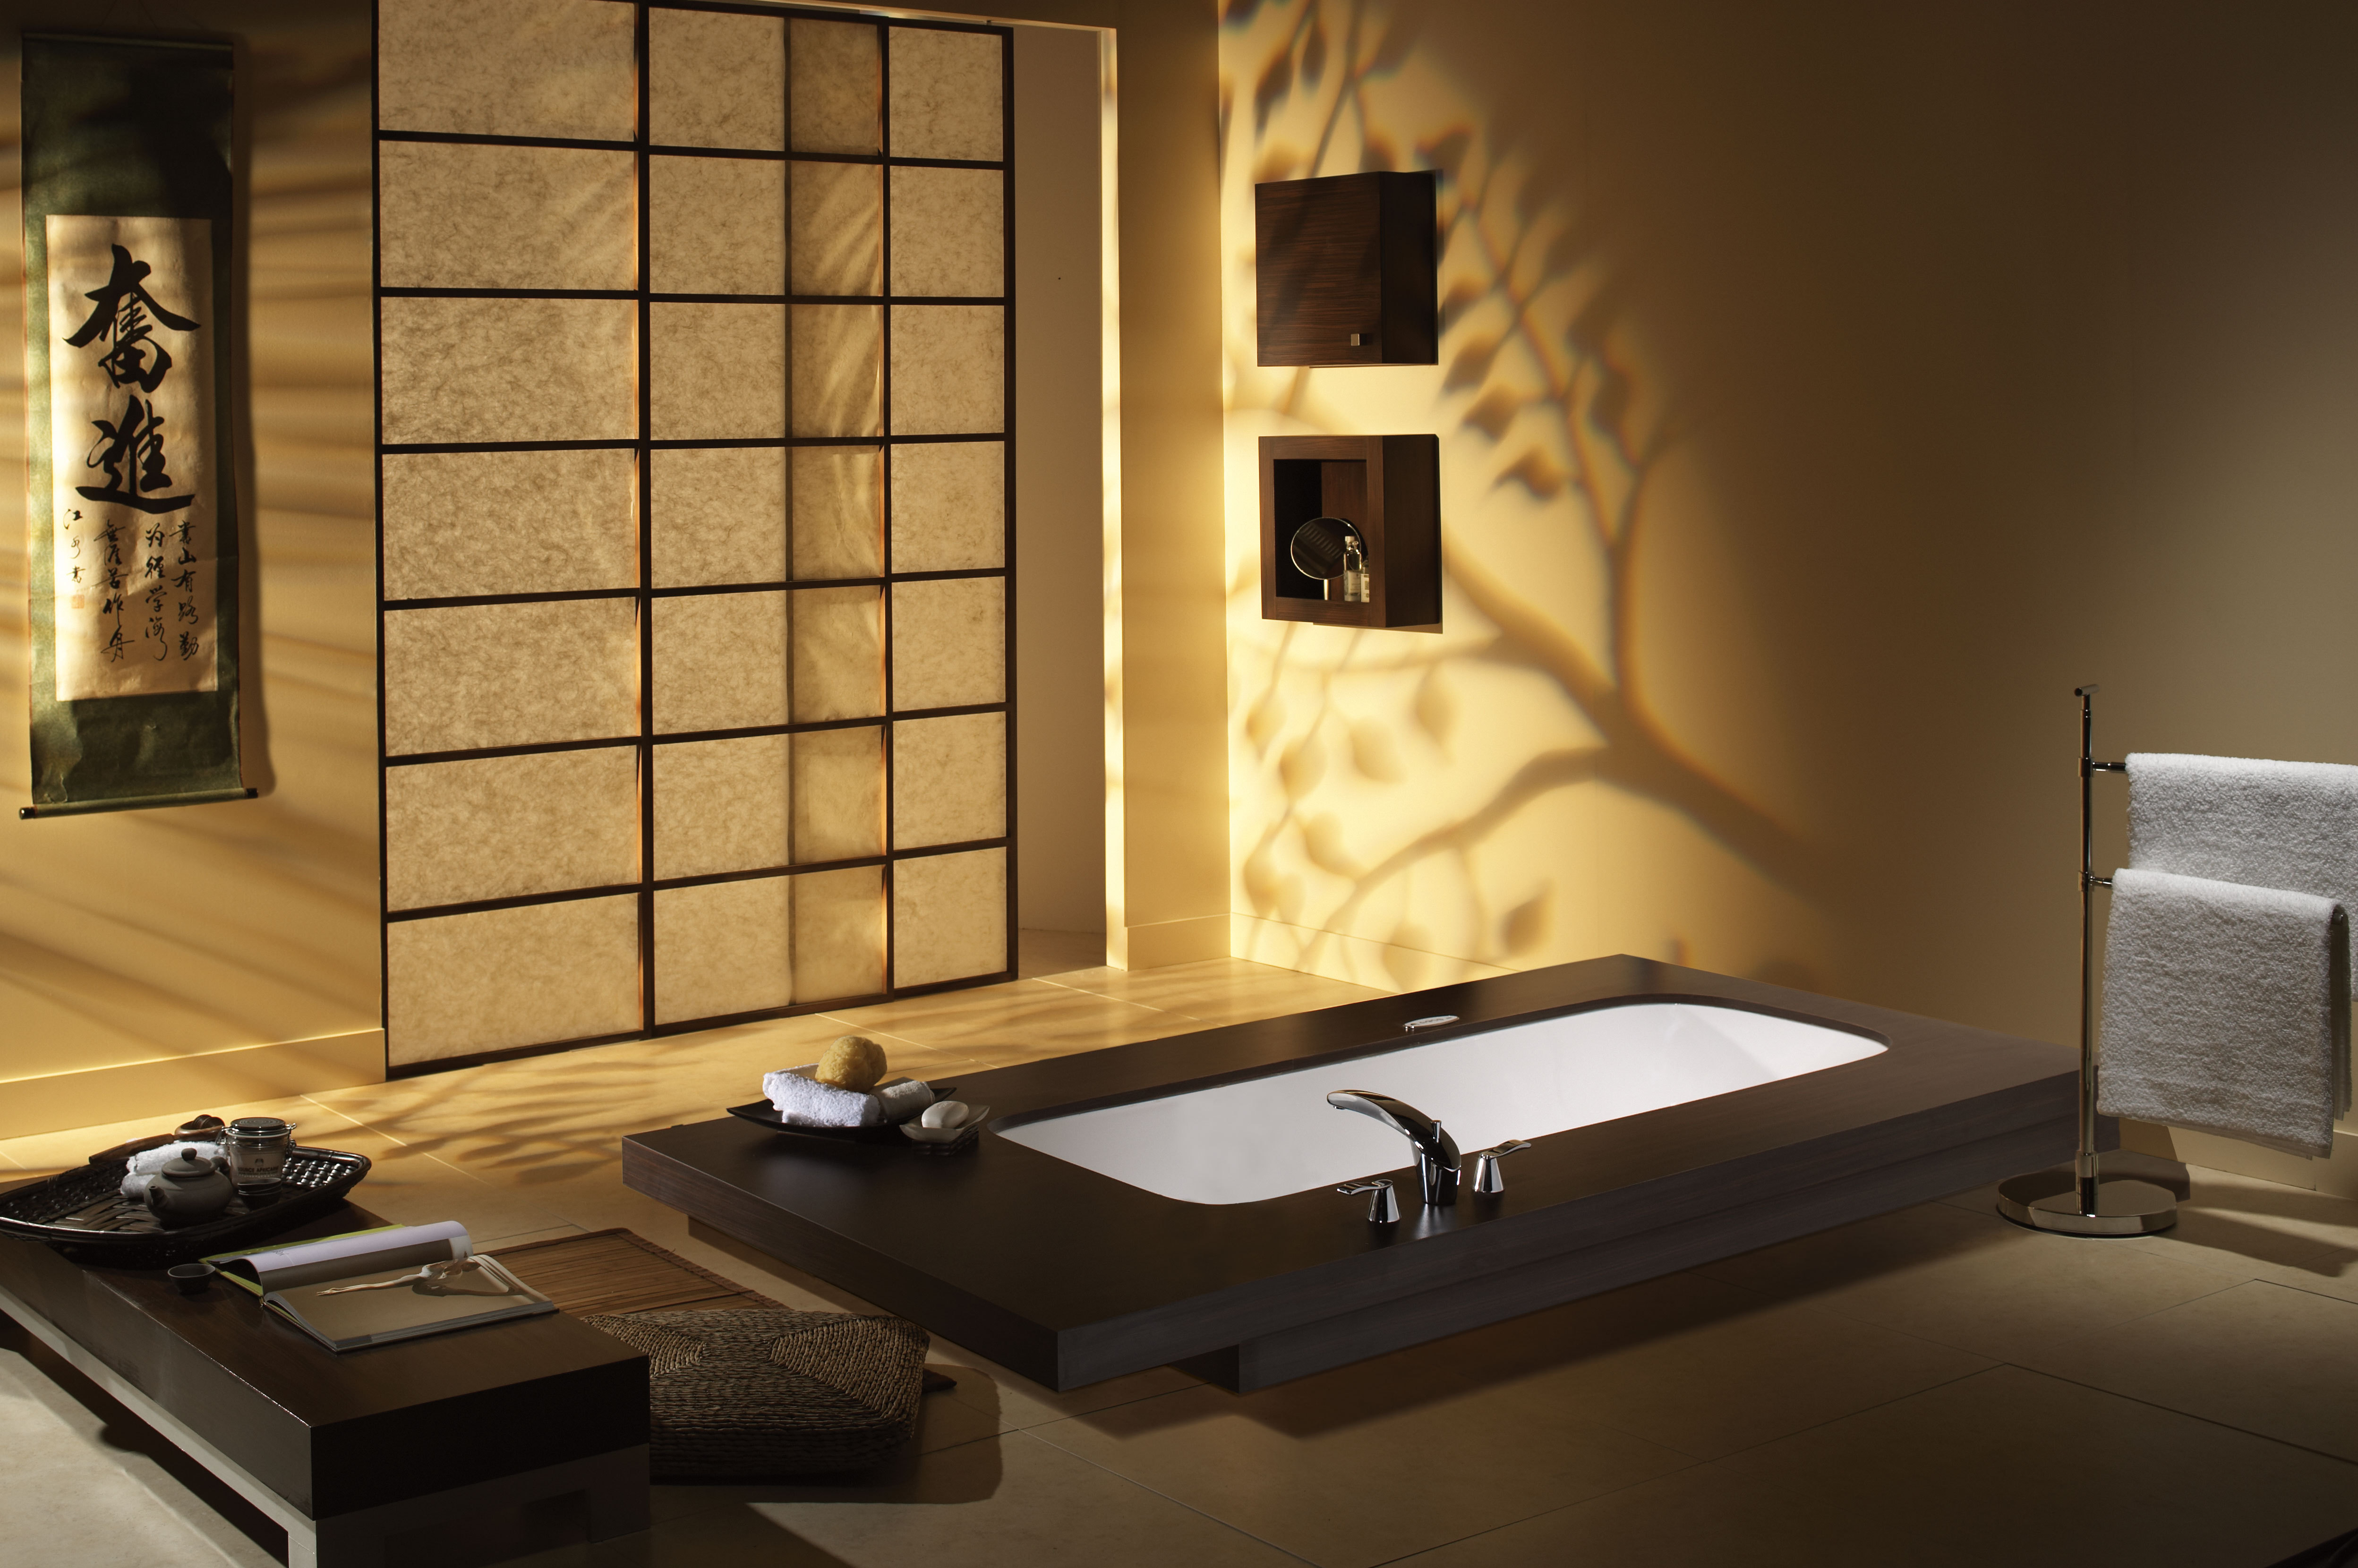 inredning badrum japansk stil minimalism vektor   ForWallpapercom 4992x3320